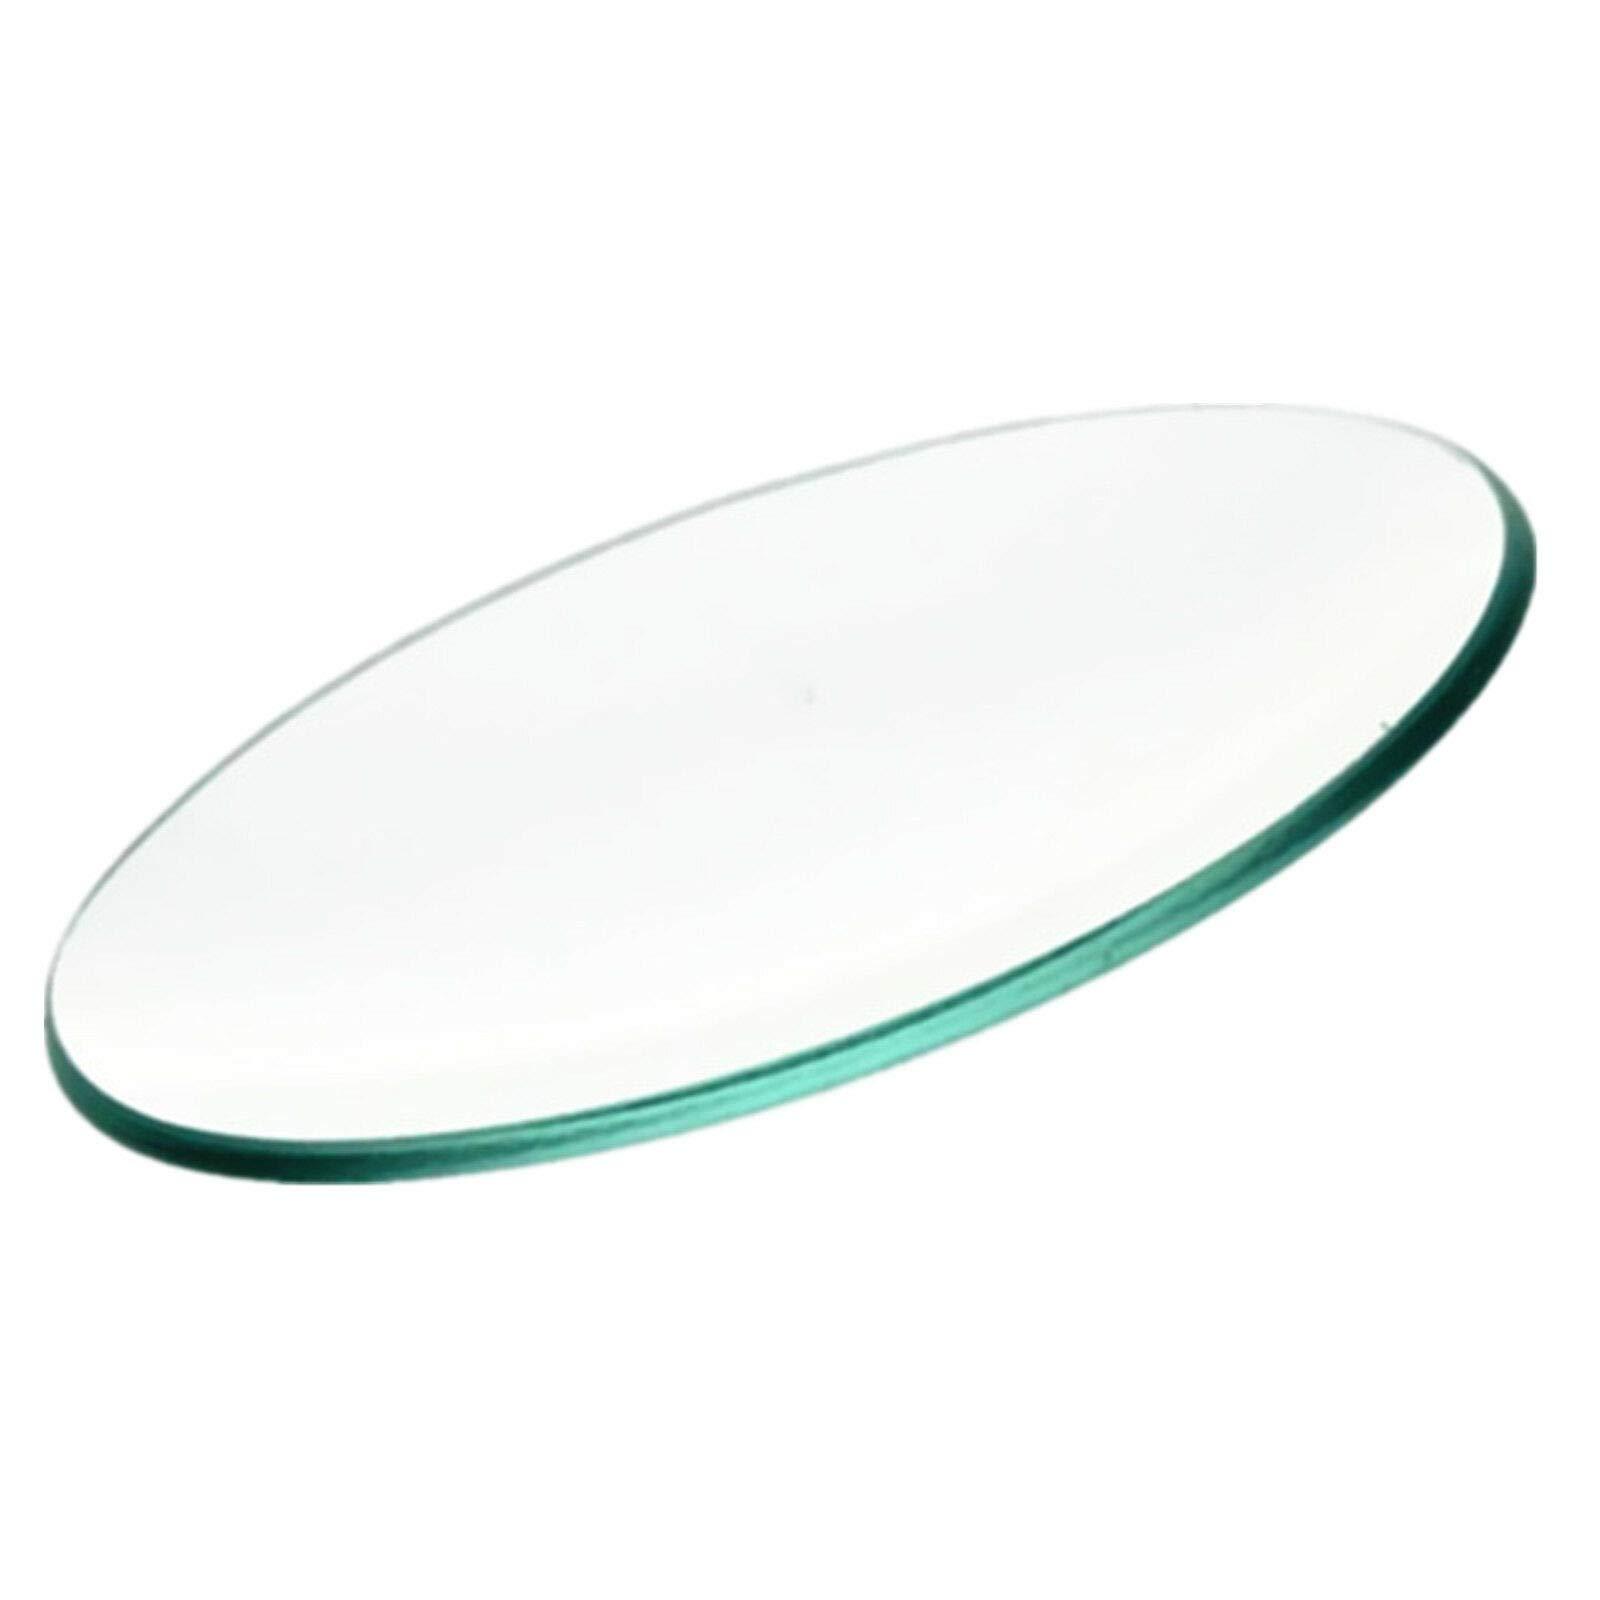 Deschem Laboratory Watch Glass Dishes,Lab Surf ace Disk 10Pcs/Lot by Deschem